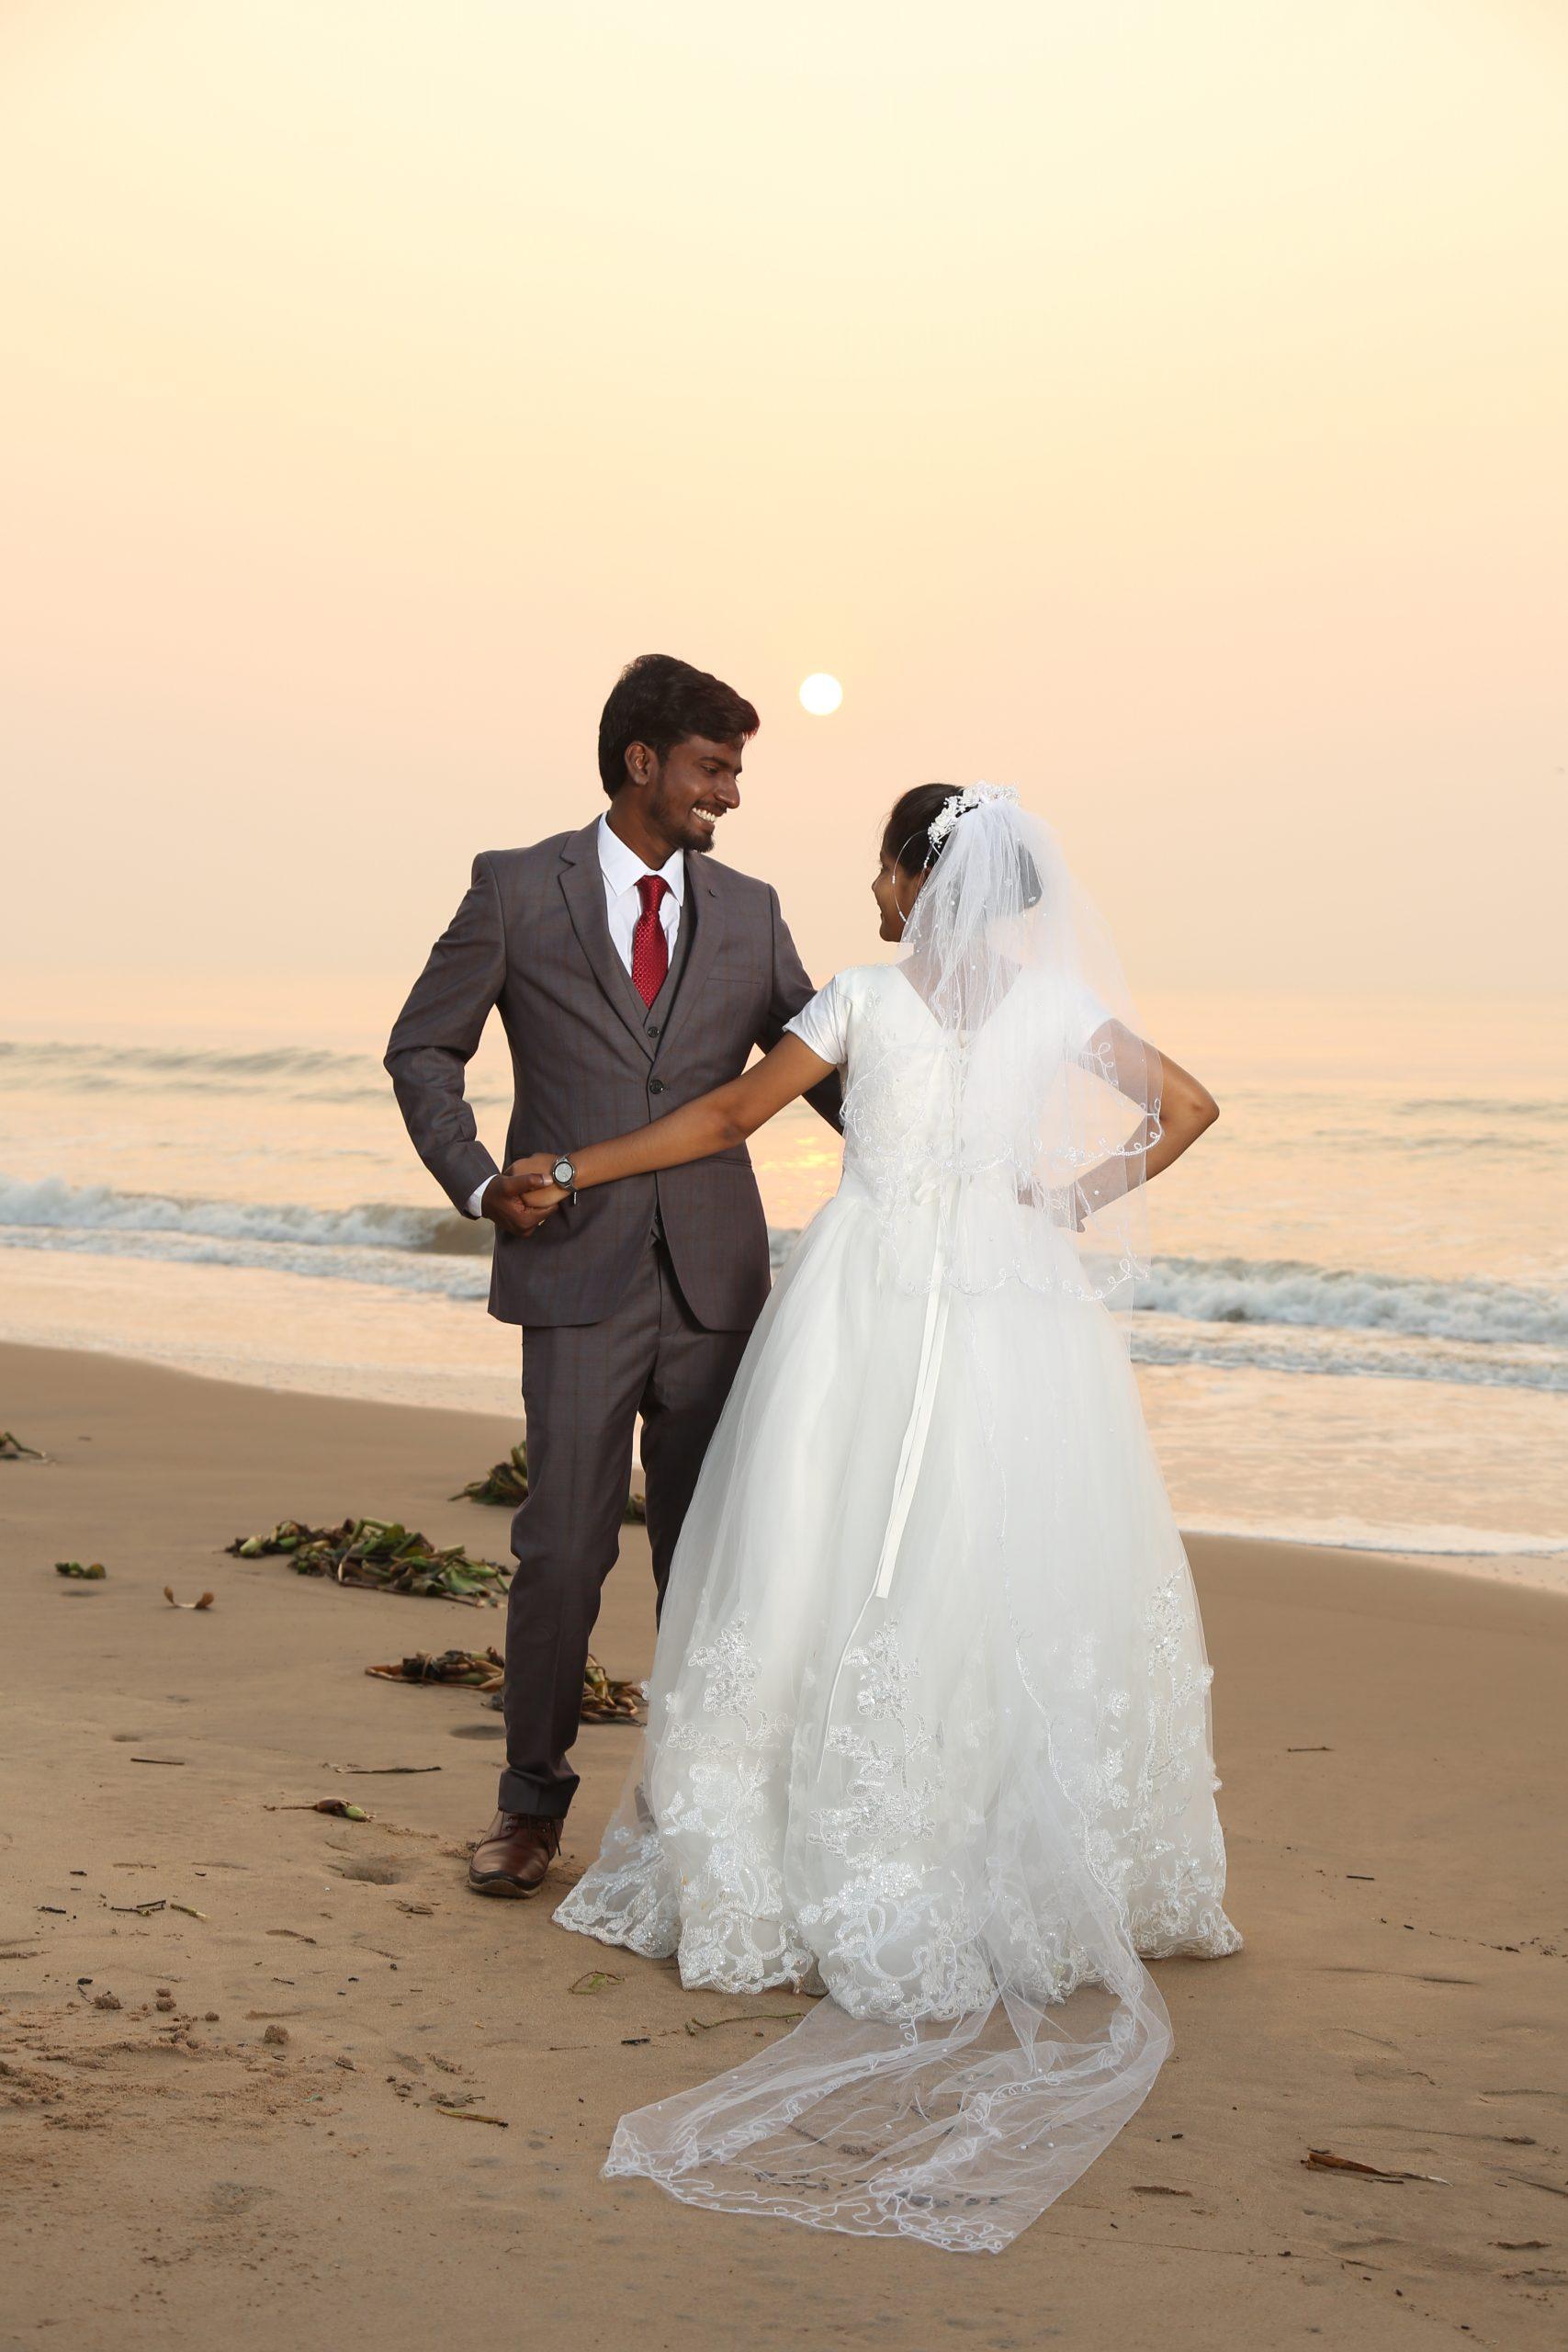 Indian wedding couple posing on the beach